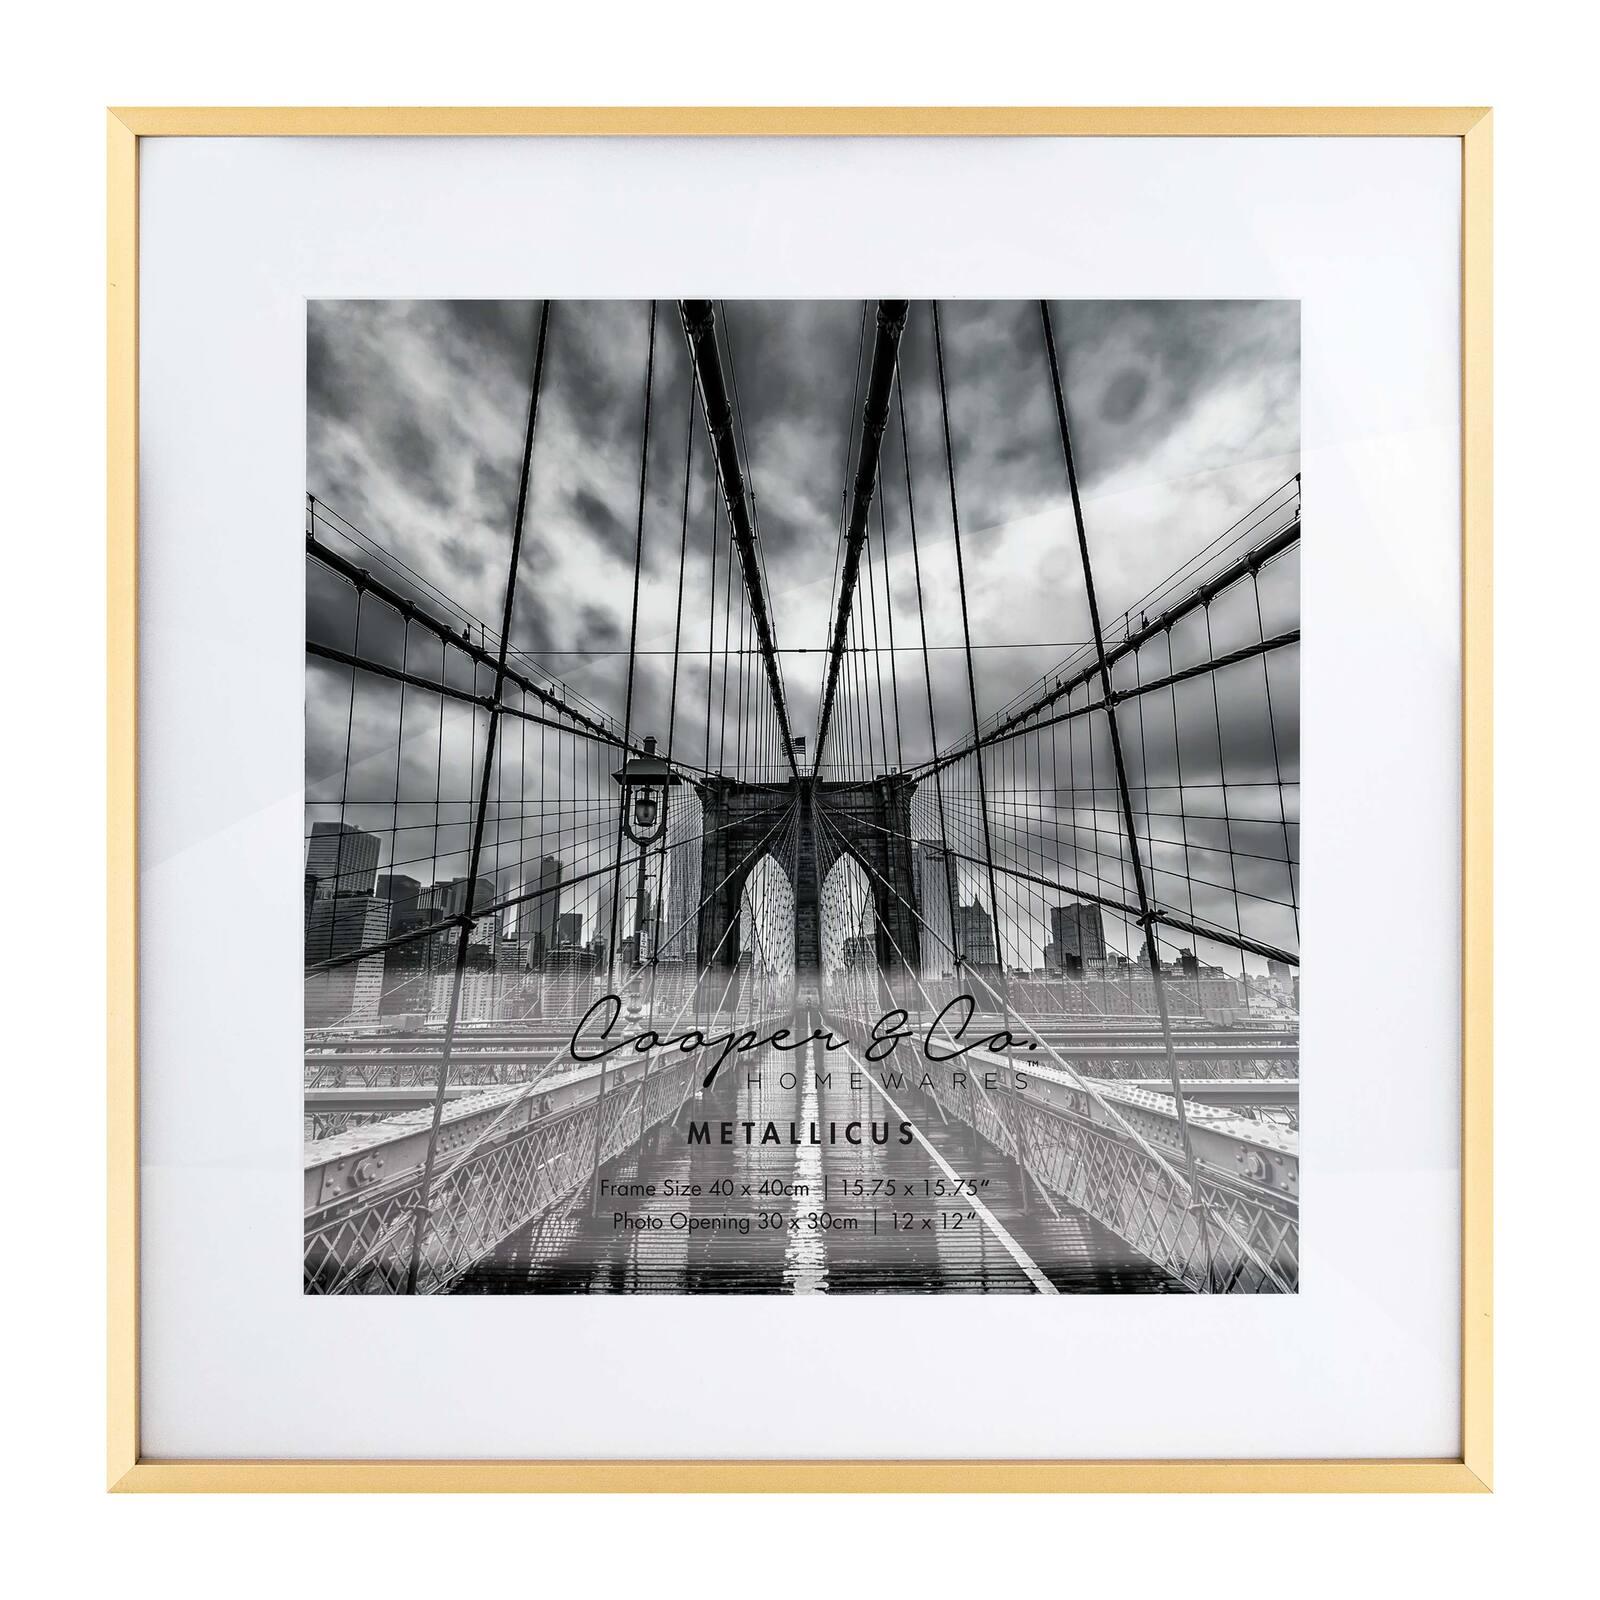 Cooper & Co. 40x40cm Mat to 30x30cm Metallicus Metal Photo Frame Gold